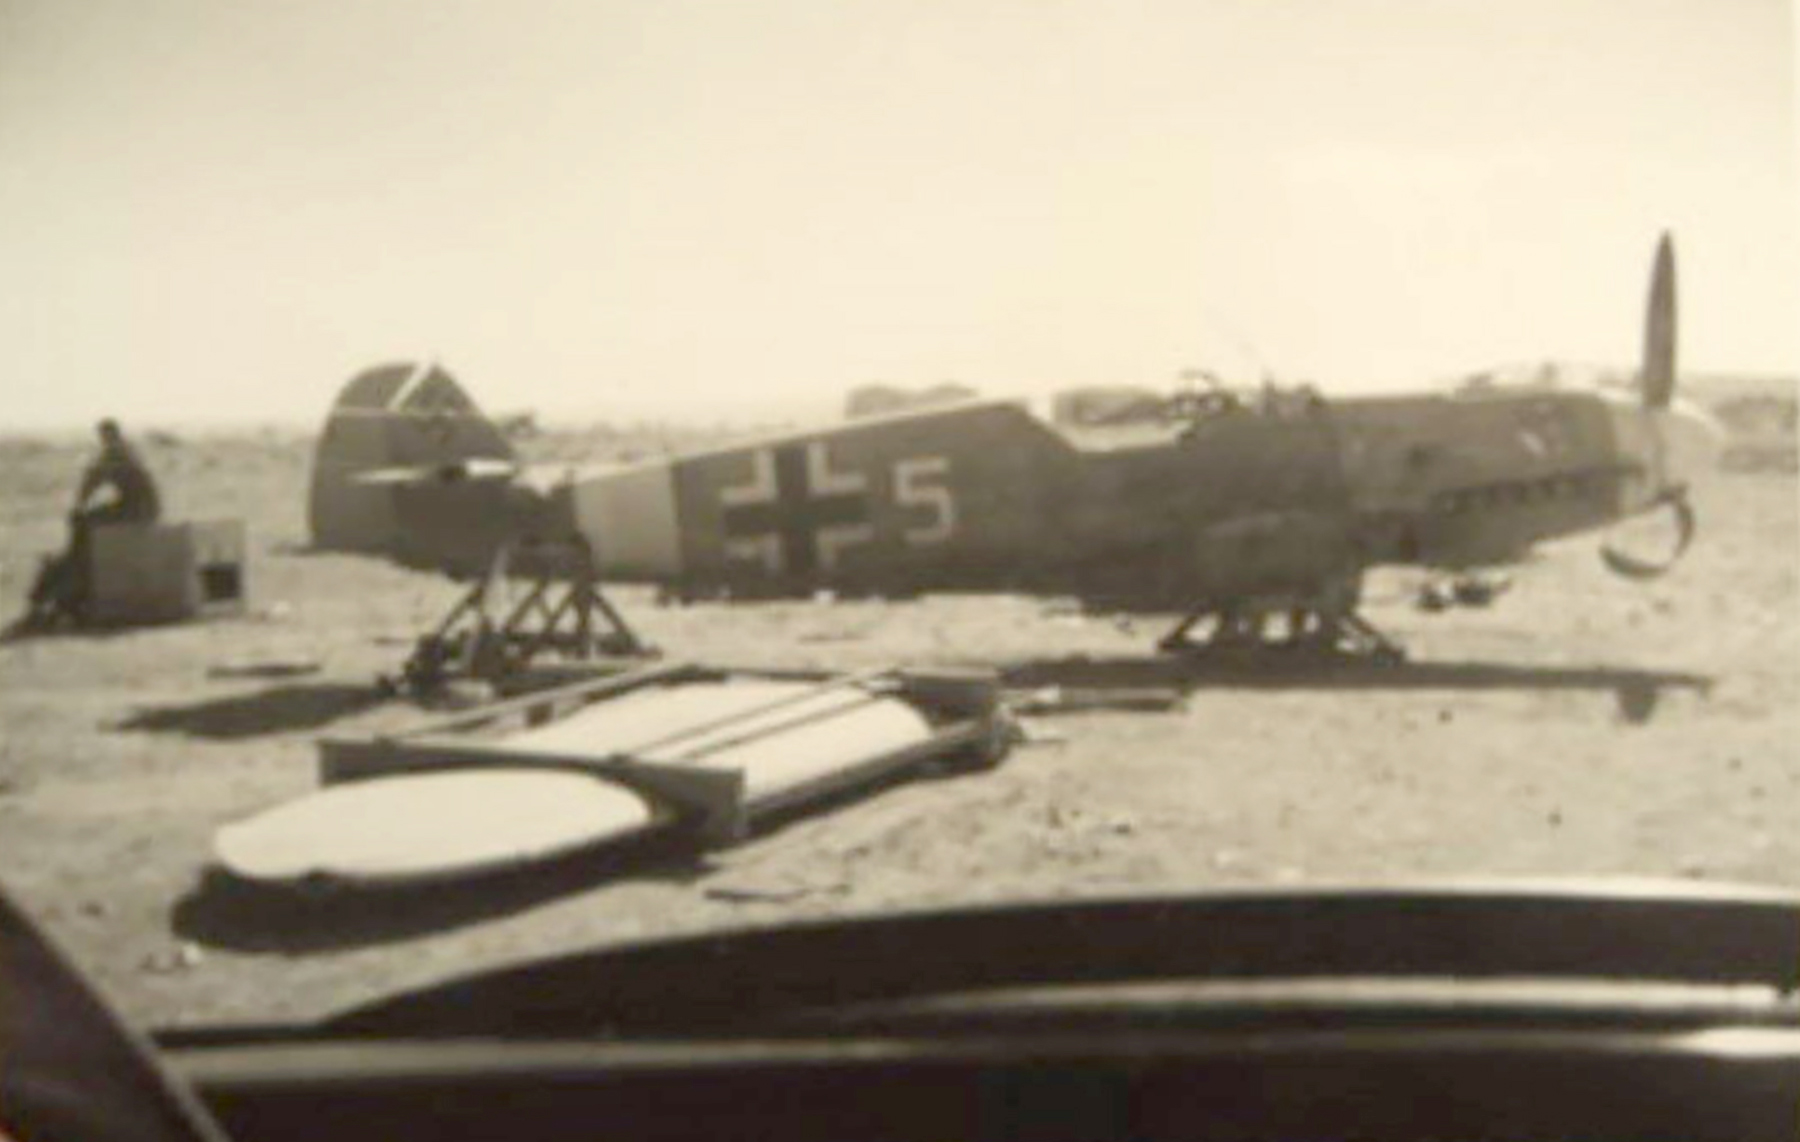 Messerschmitt Bf 109F4Trop 1.JG27 White 5 Albert Espenlaub crash landed El Adem Dec 1941 05